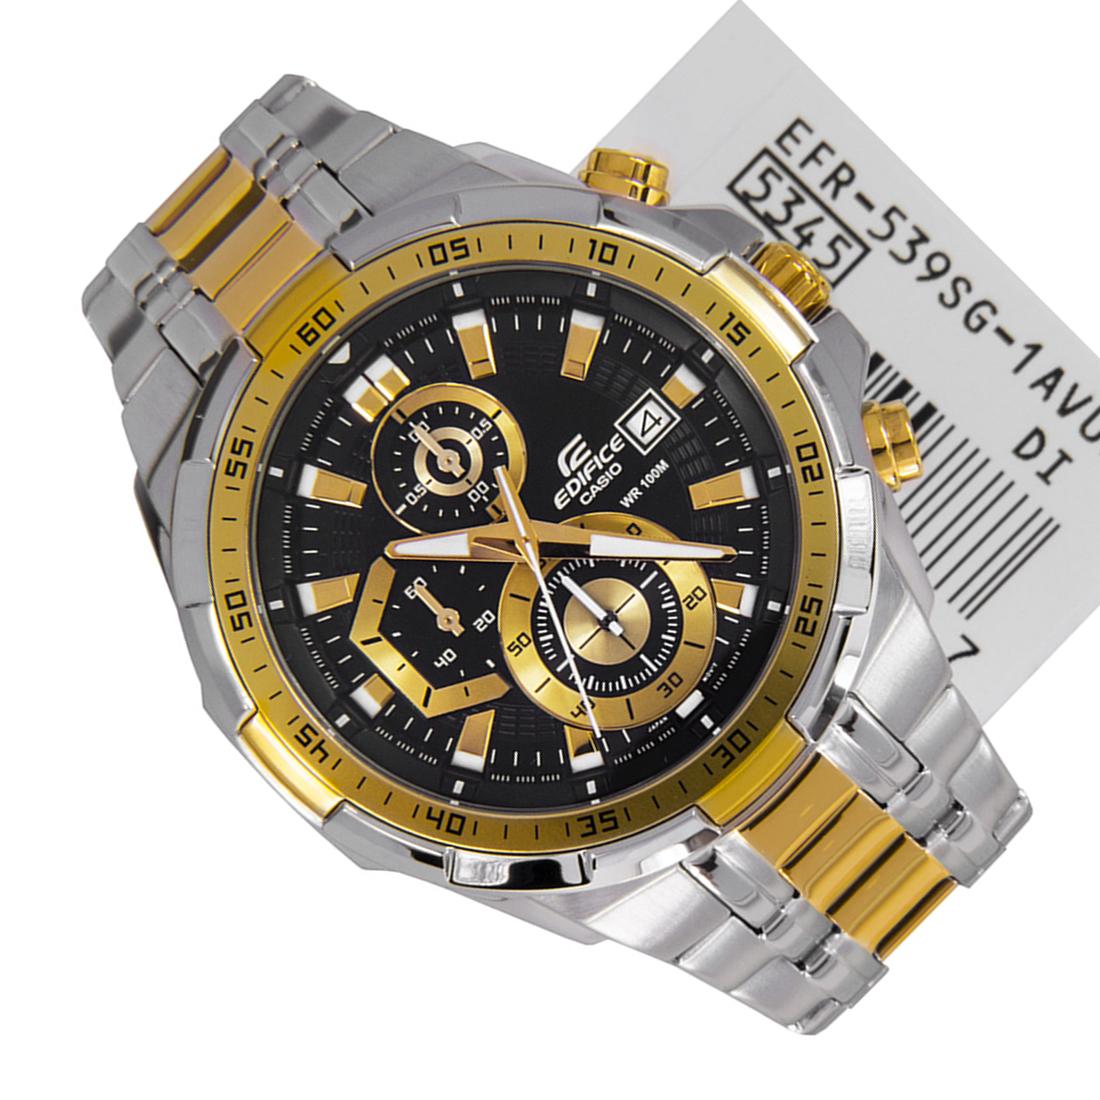 Casio นาฬิกาข้อมือชาย สายสแตนเลส รุ่น EFR-539SG-1A Silver/gold รับประกัน 1 ปี(ของแท้100% ประกันCMG) lhp7